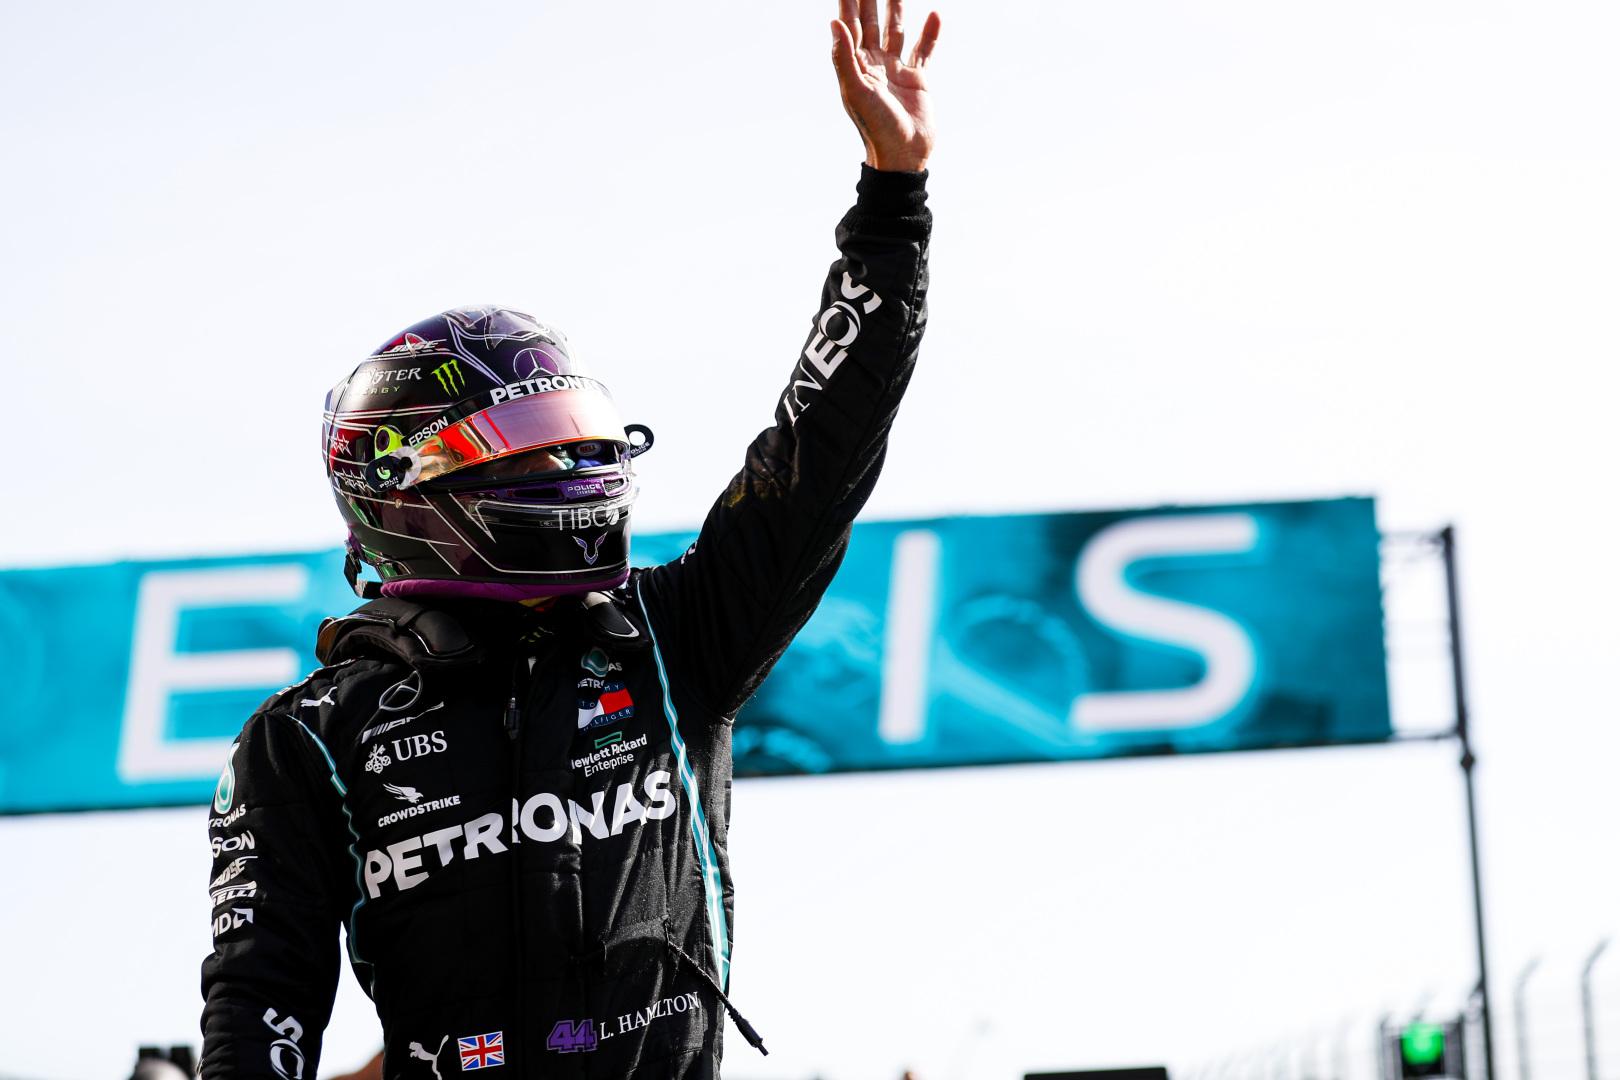 Portugalijoje dominavęs L. Hamiltonas pagerino M. Schumacherio rekordą